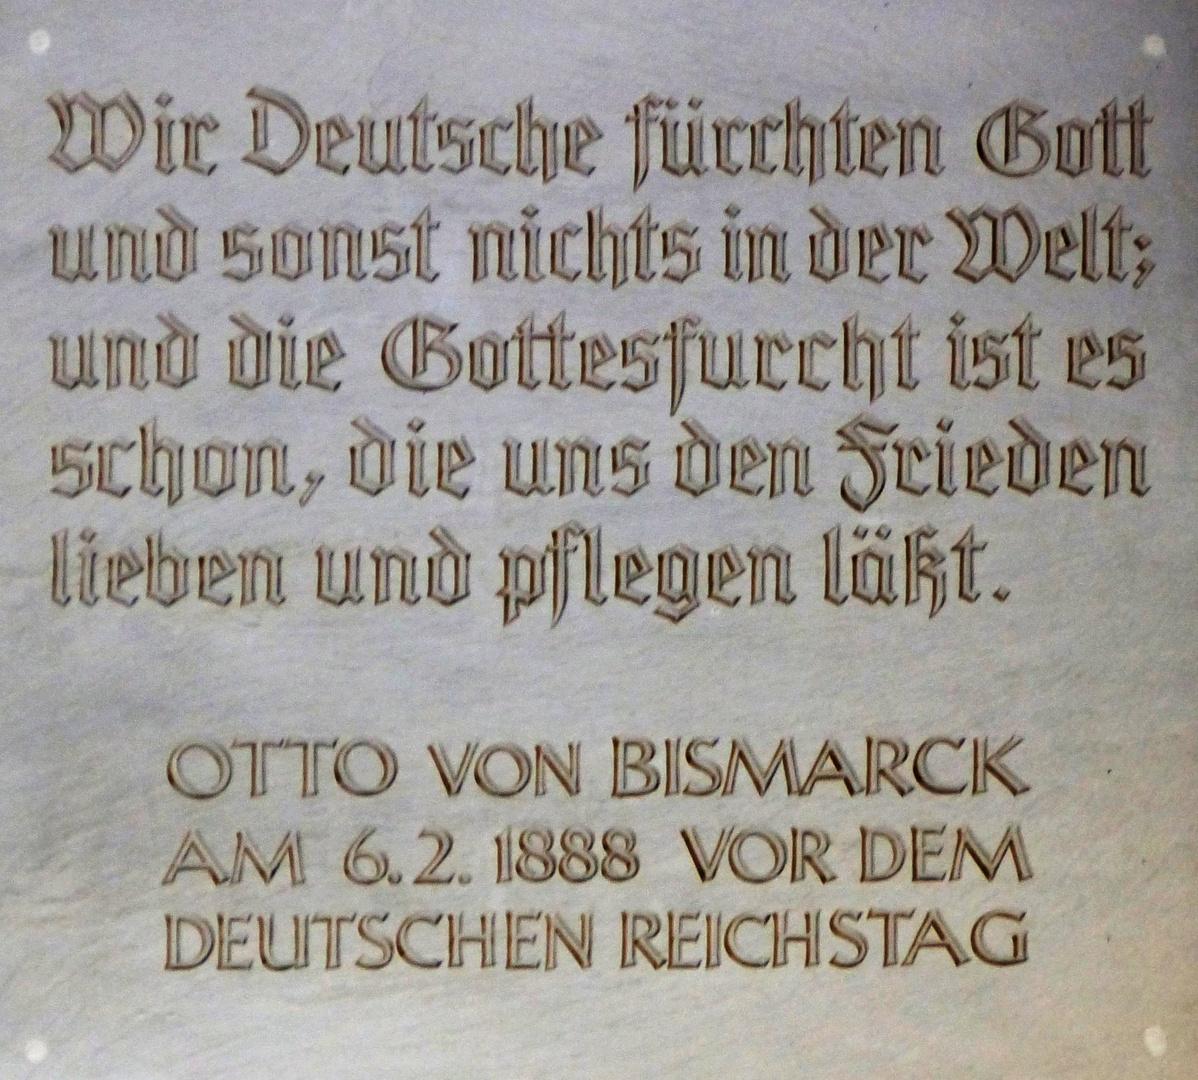 Bismarck Gedenktafel - Markige Worte